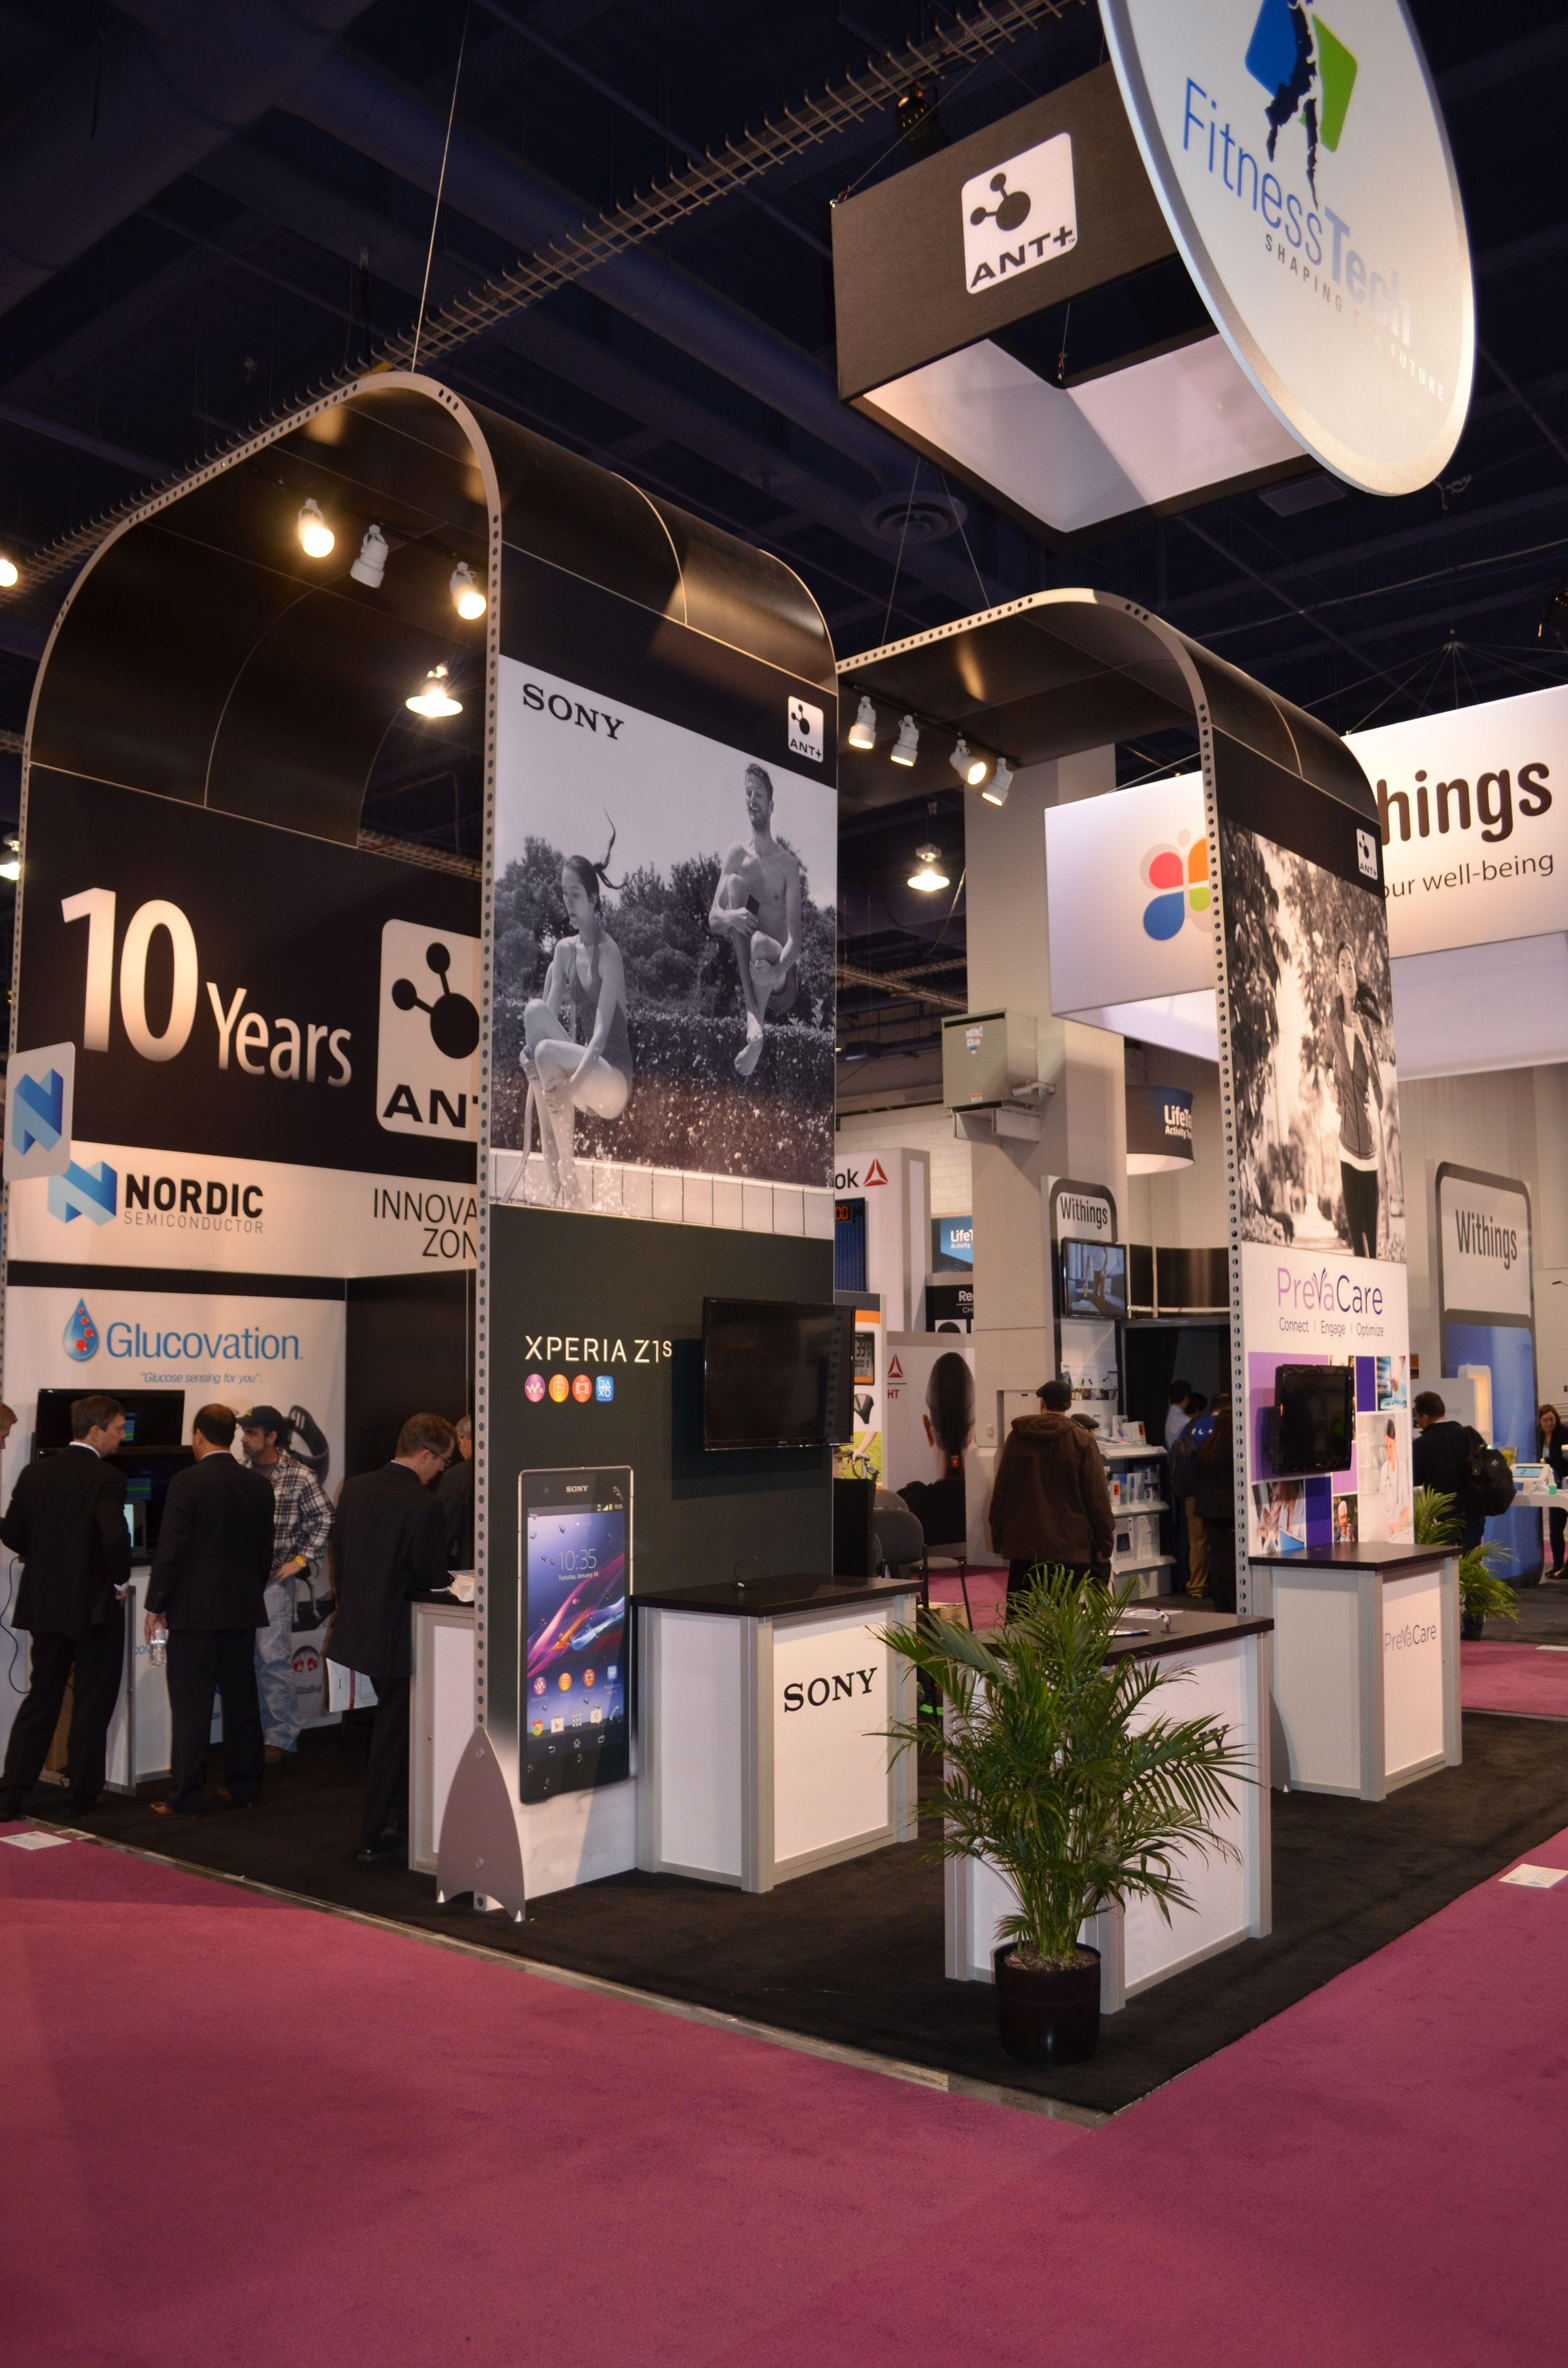 Exhibition Booth Las Vegas : Trade show rental ces show las vegas convention center